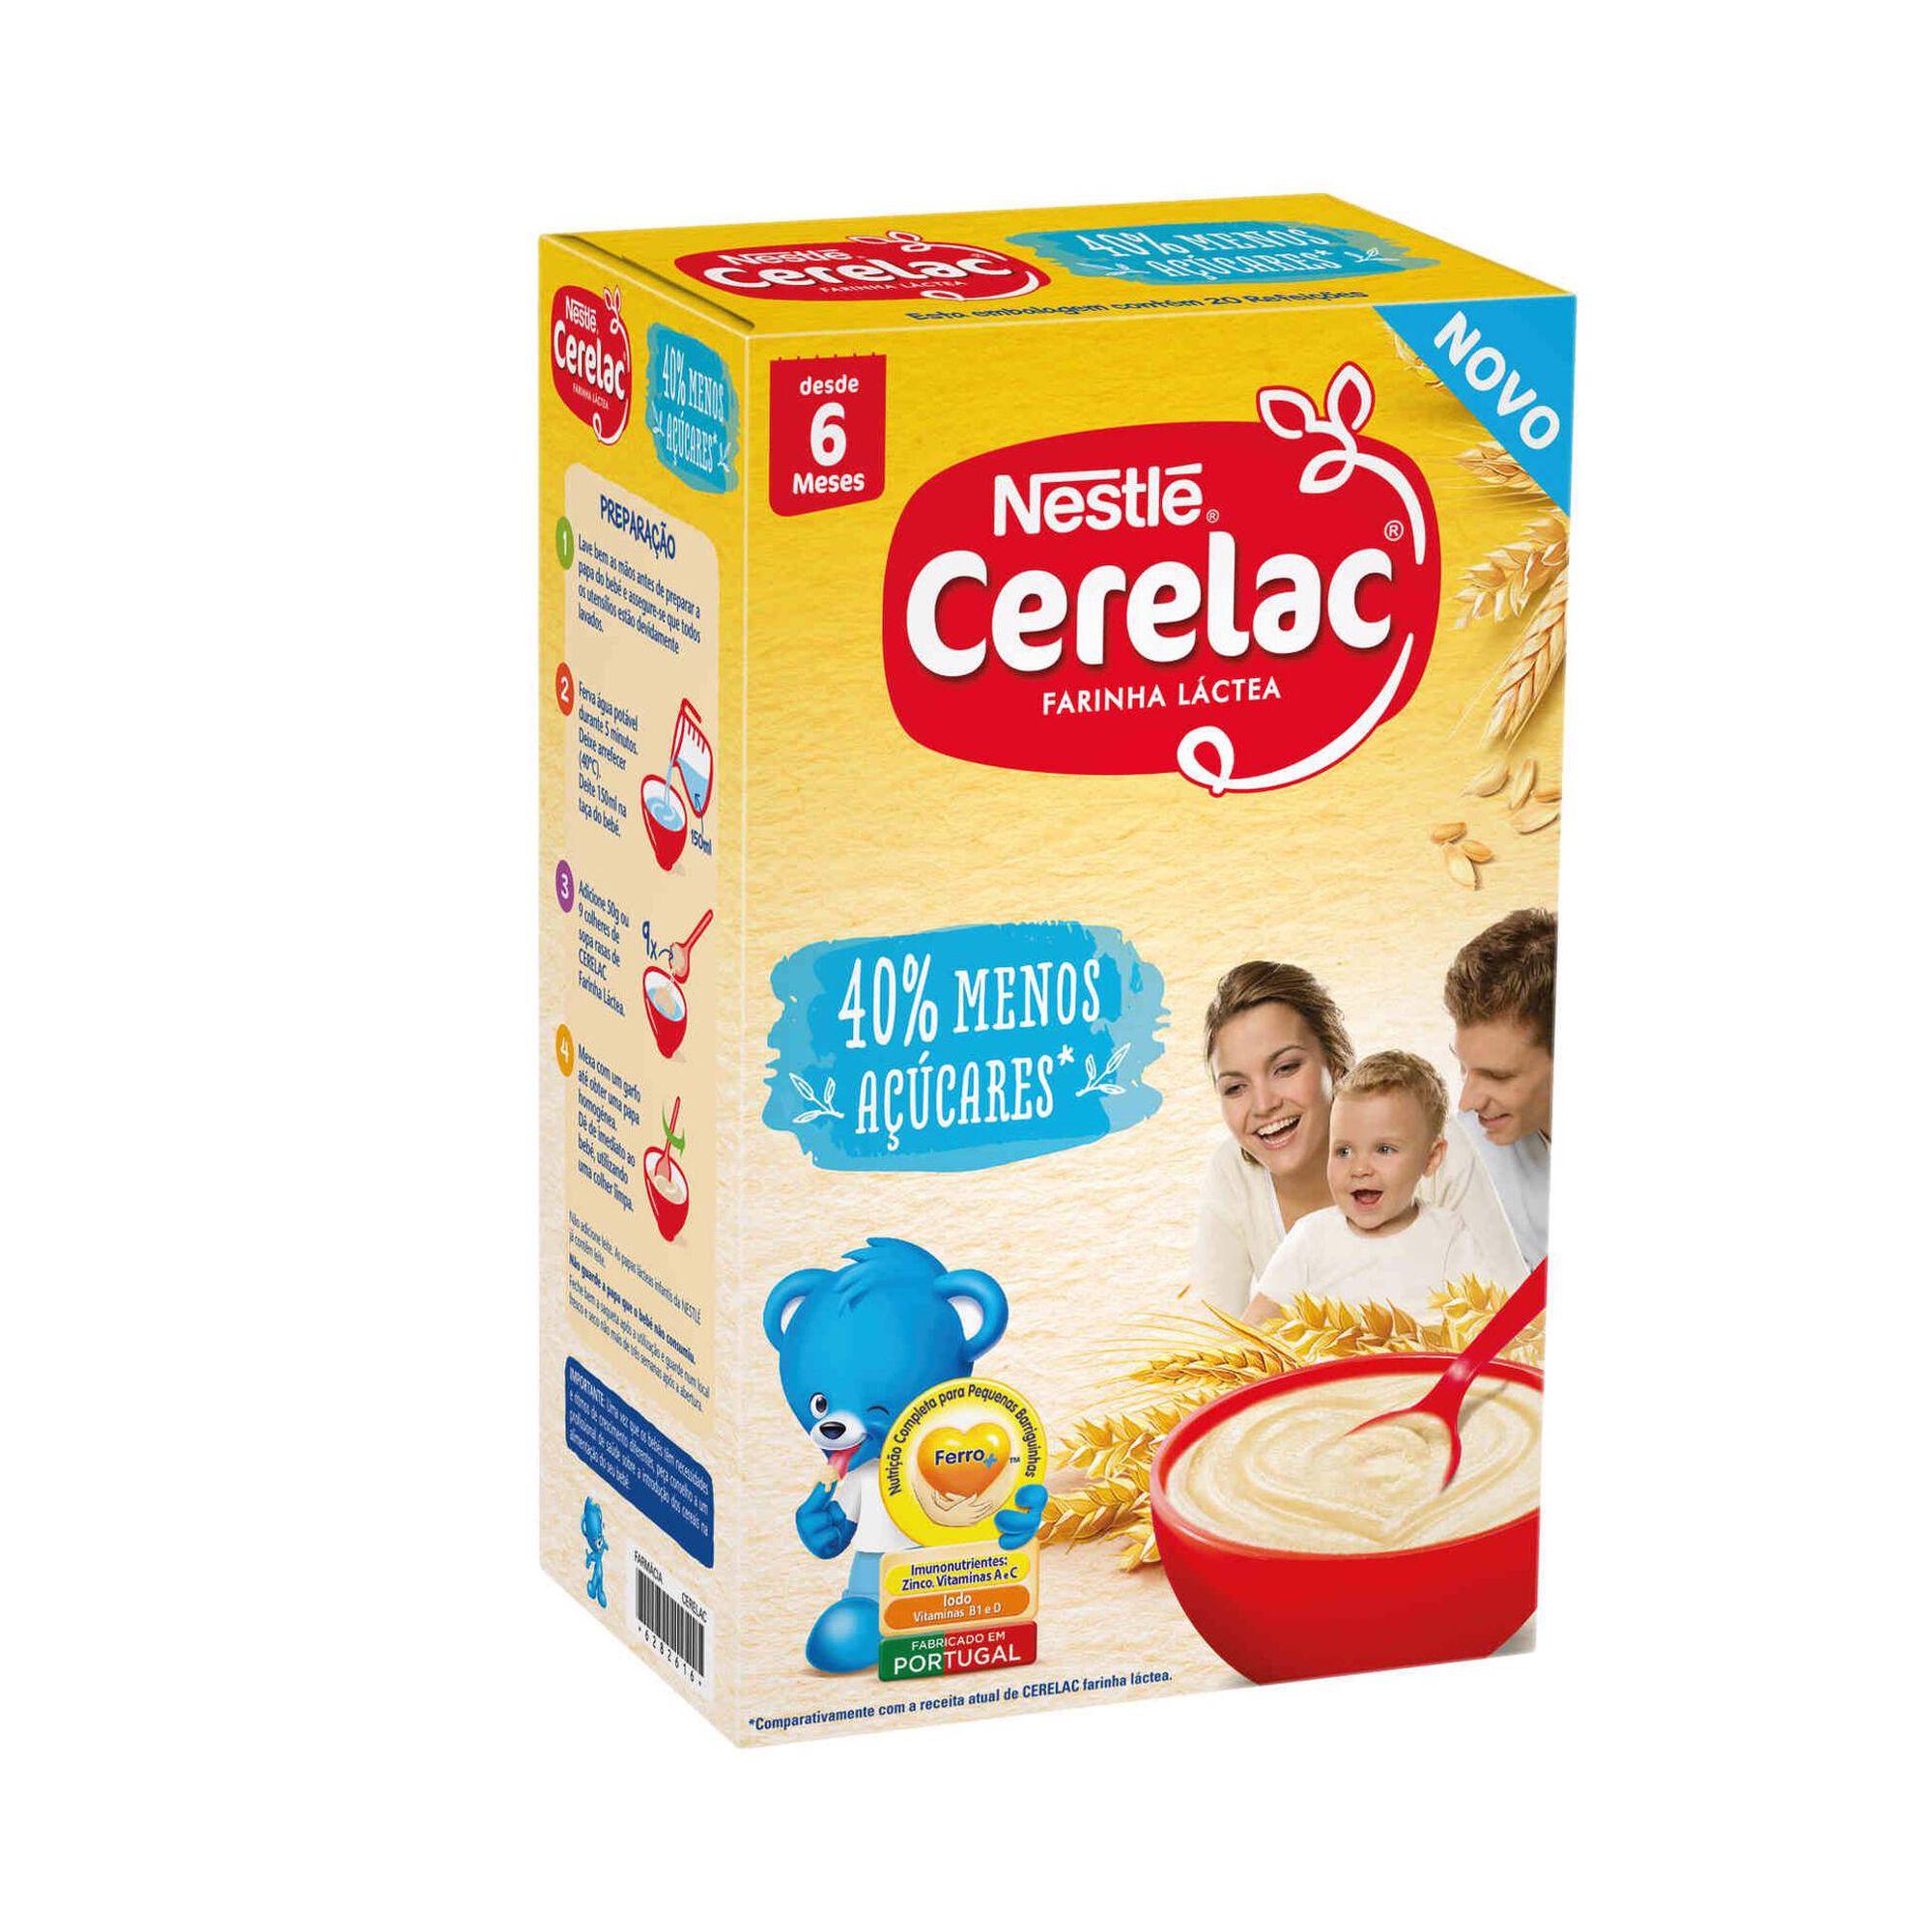 Papa Infantil Farinha Láctea 40% Menos Açúcares +6 Meses